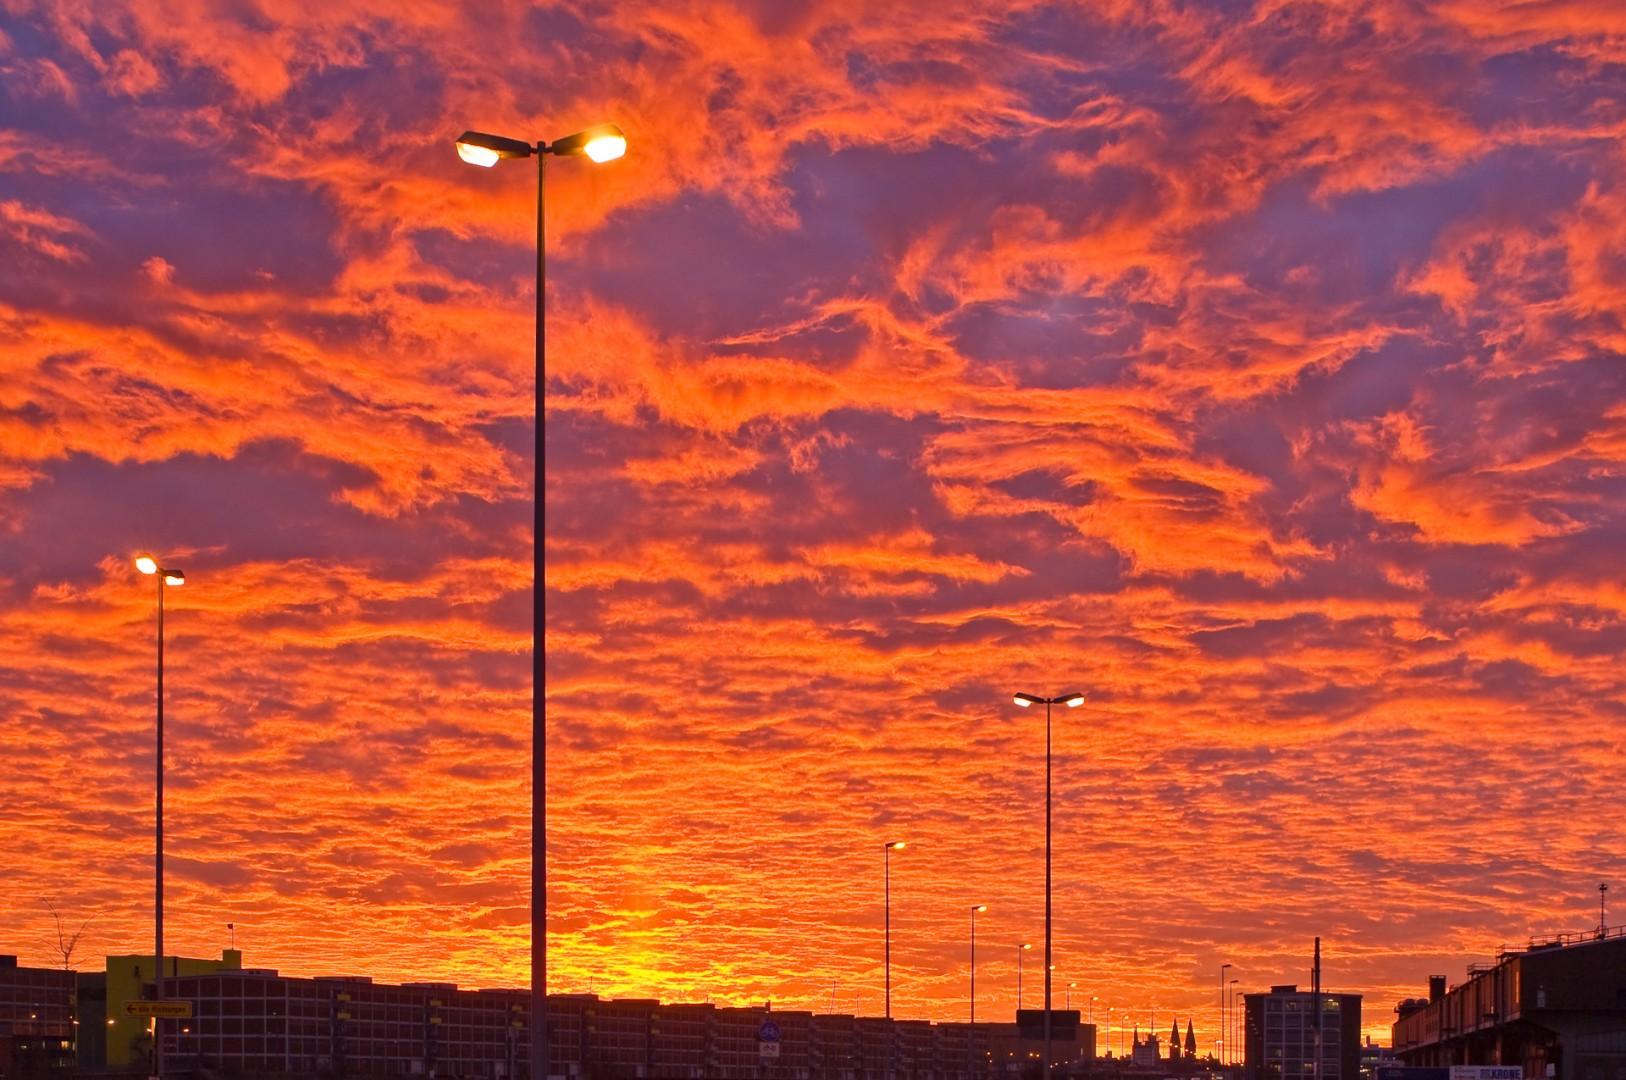 Sonnenuntergang in Bremen Überseestadt